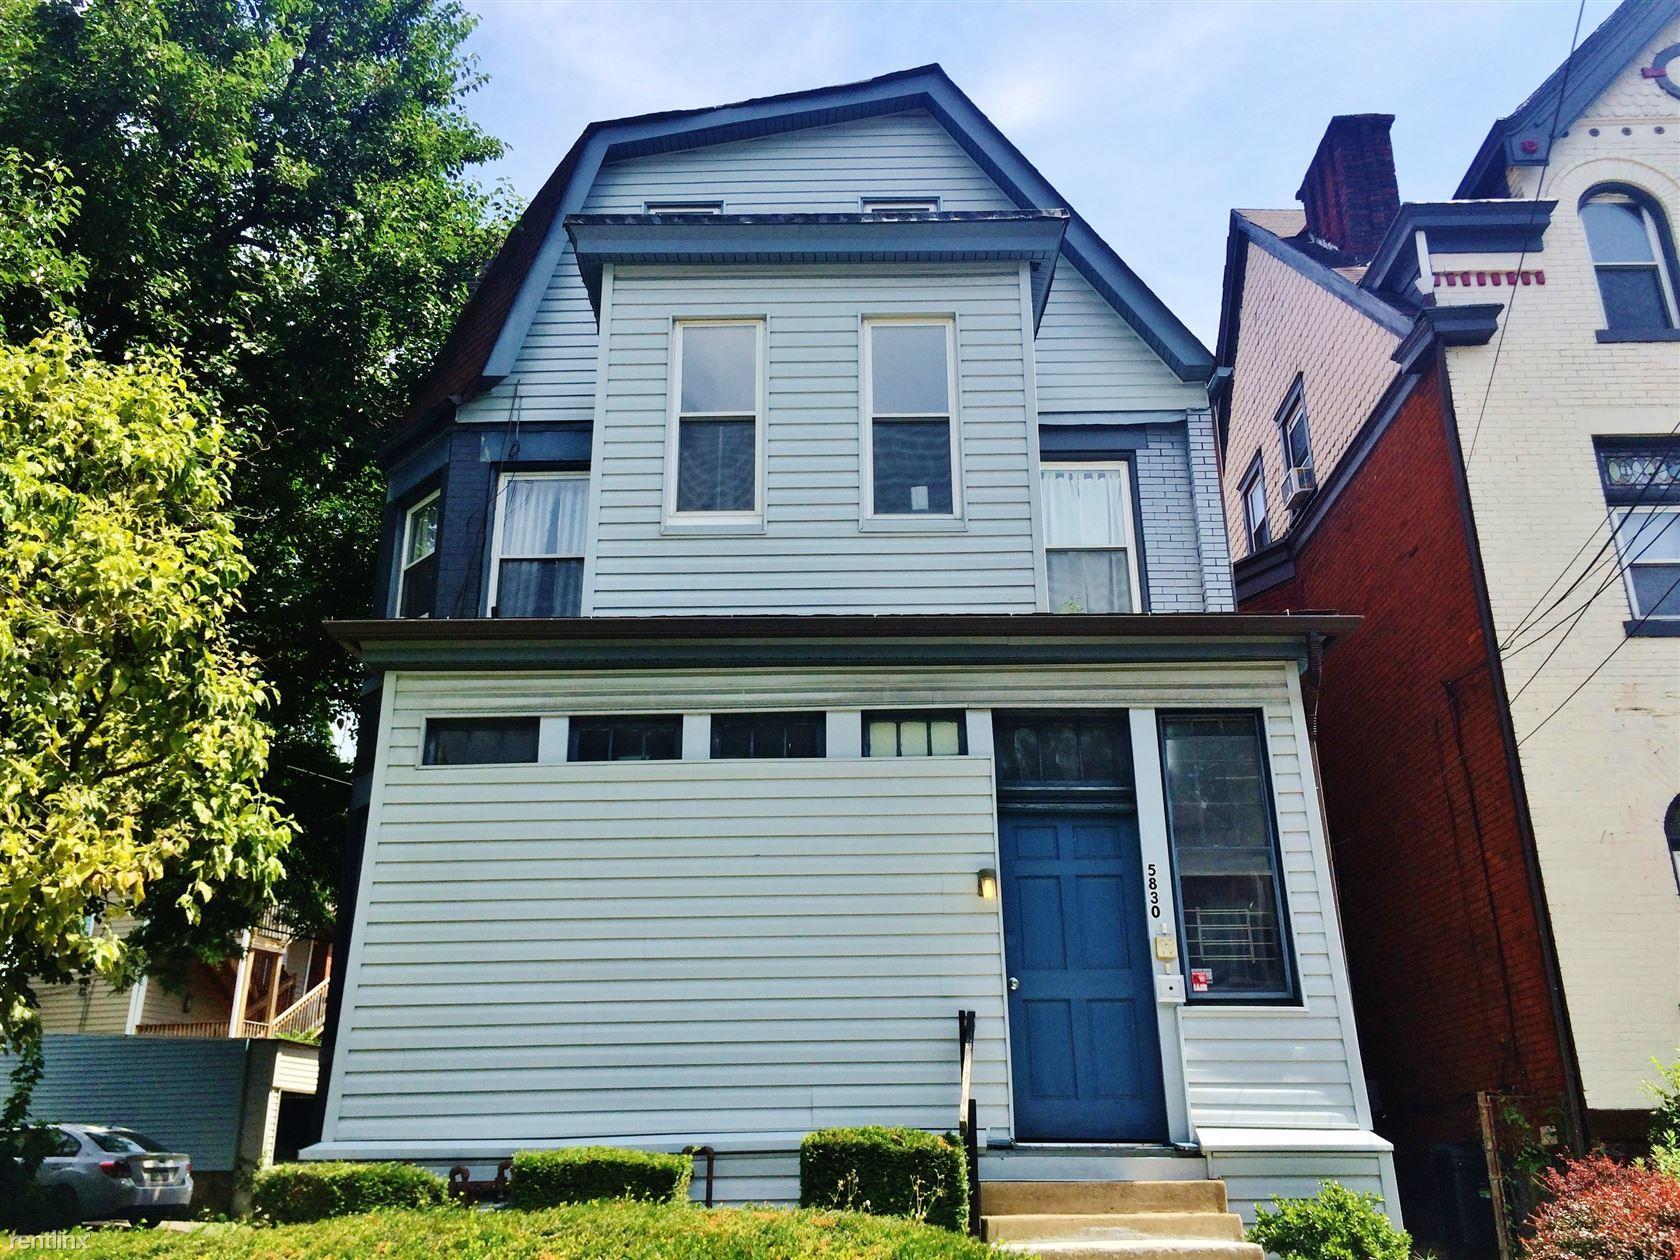 Studio, 1.0 bath, $825 Rentals - Pittsburgh, PA | Trulia